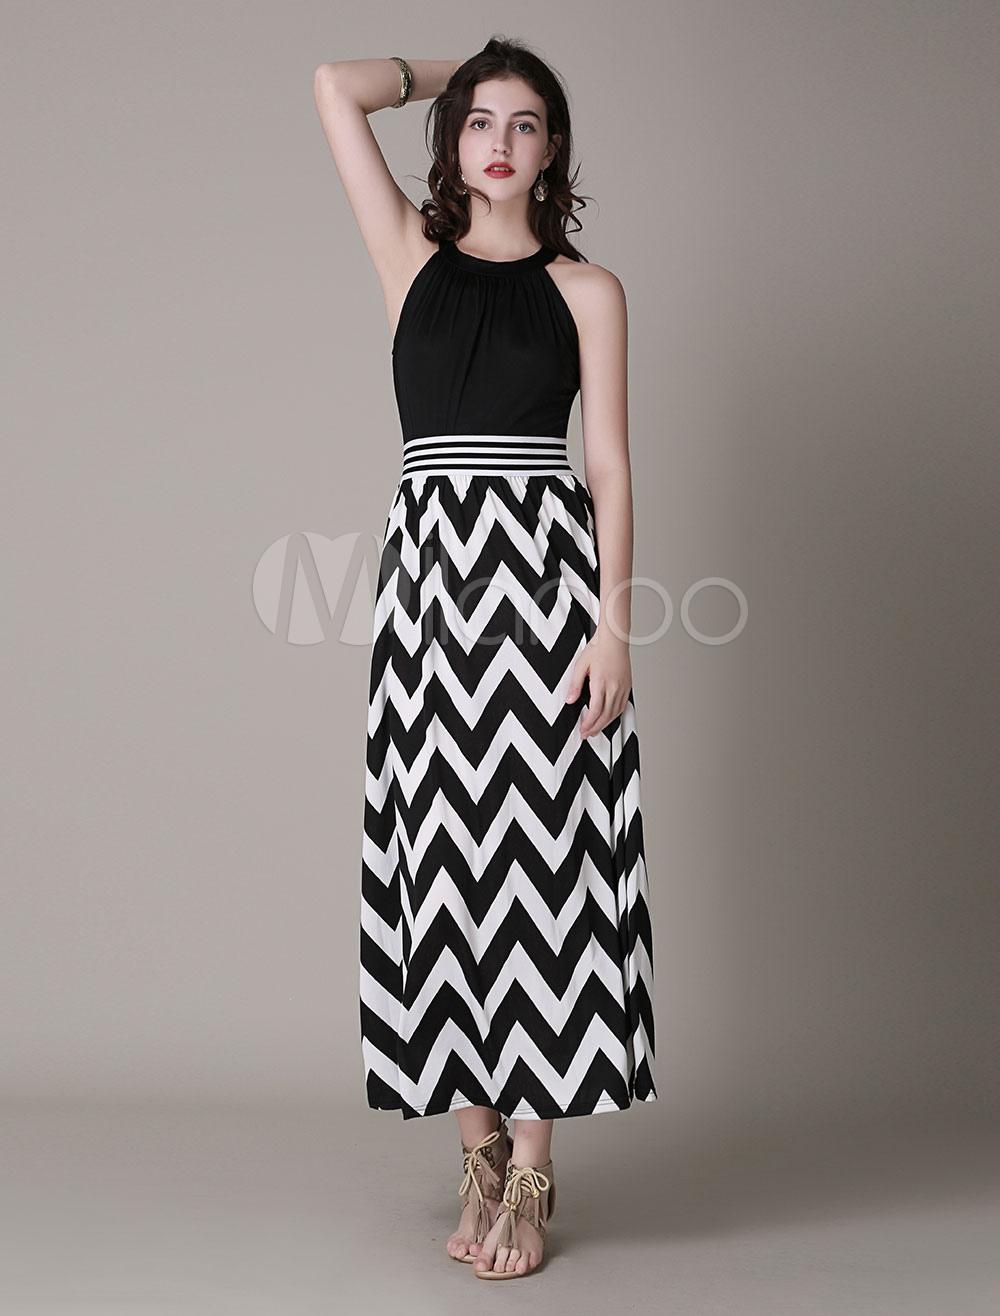 Zig Zag Printed Halter Long Dress (Women\\'s Clothing Maxi Dresses) photo